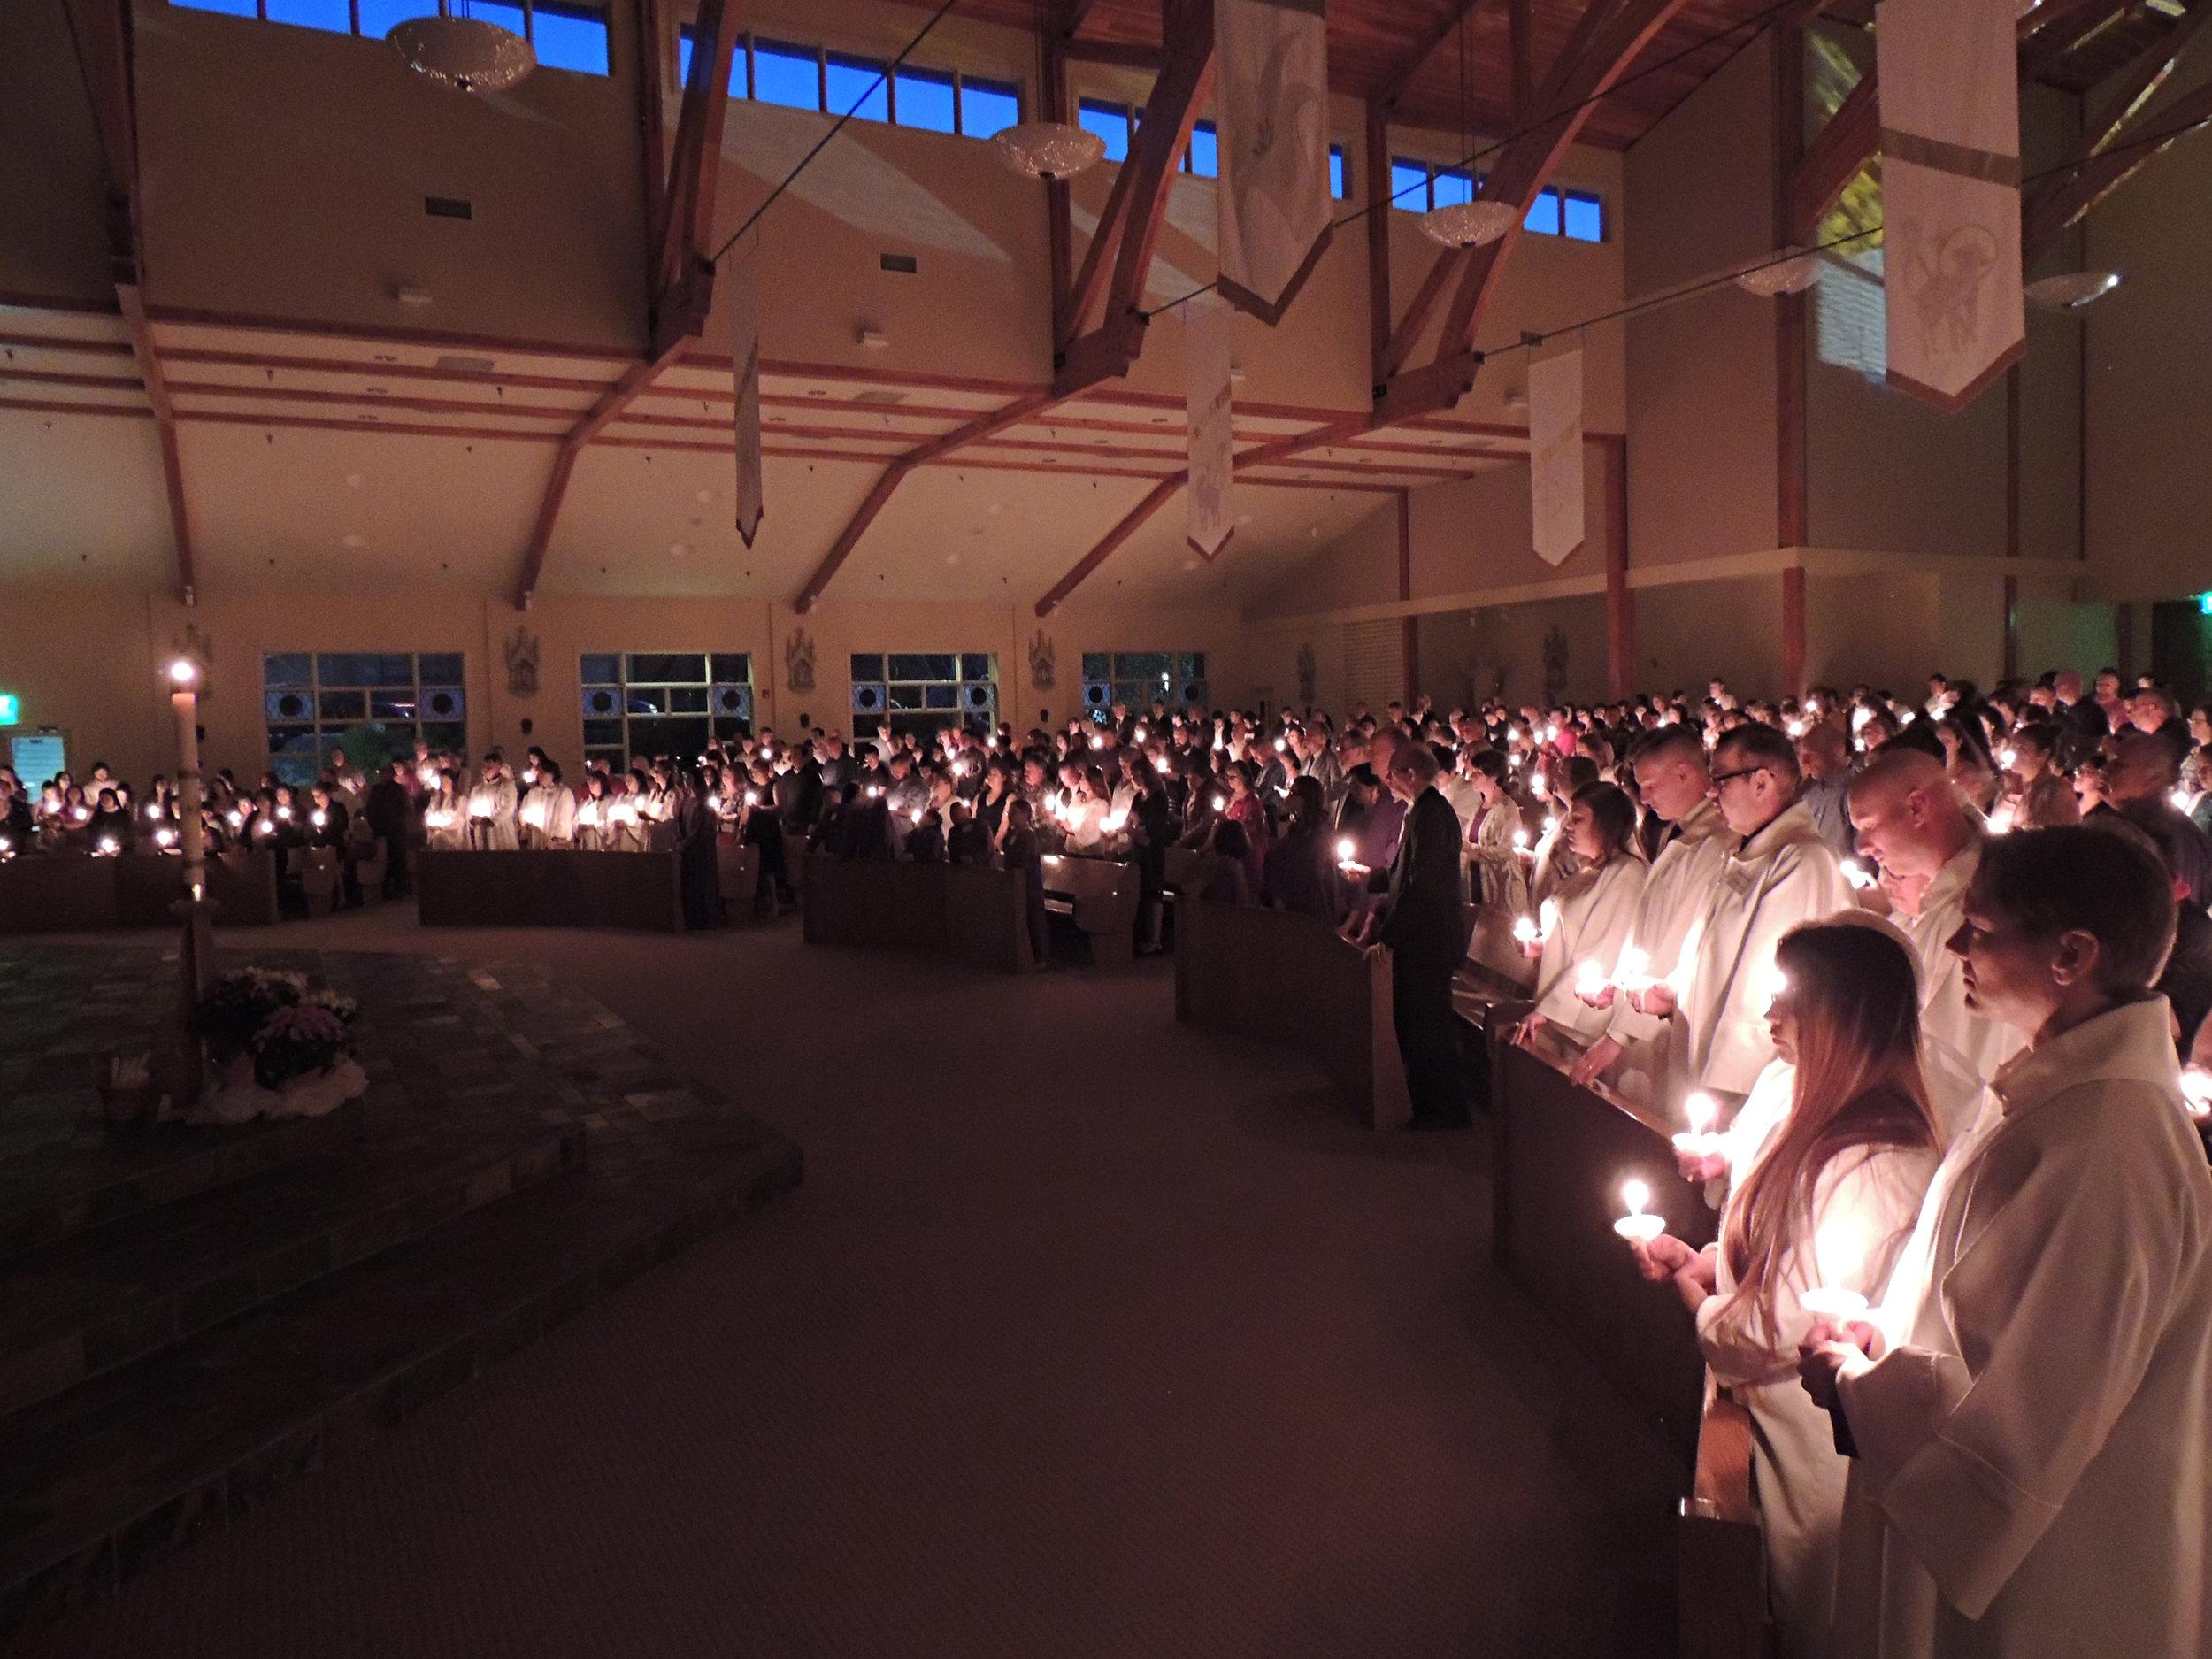 2019-0420-144-Candles.JPG